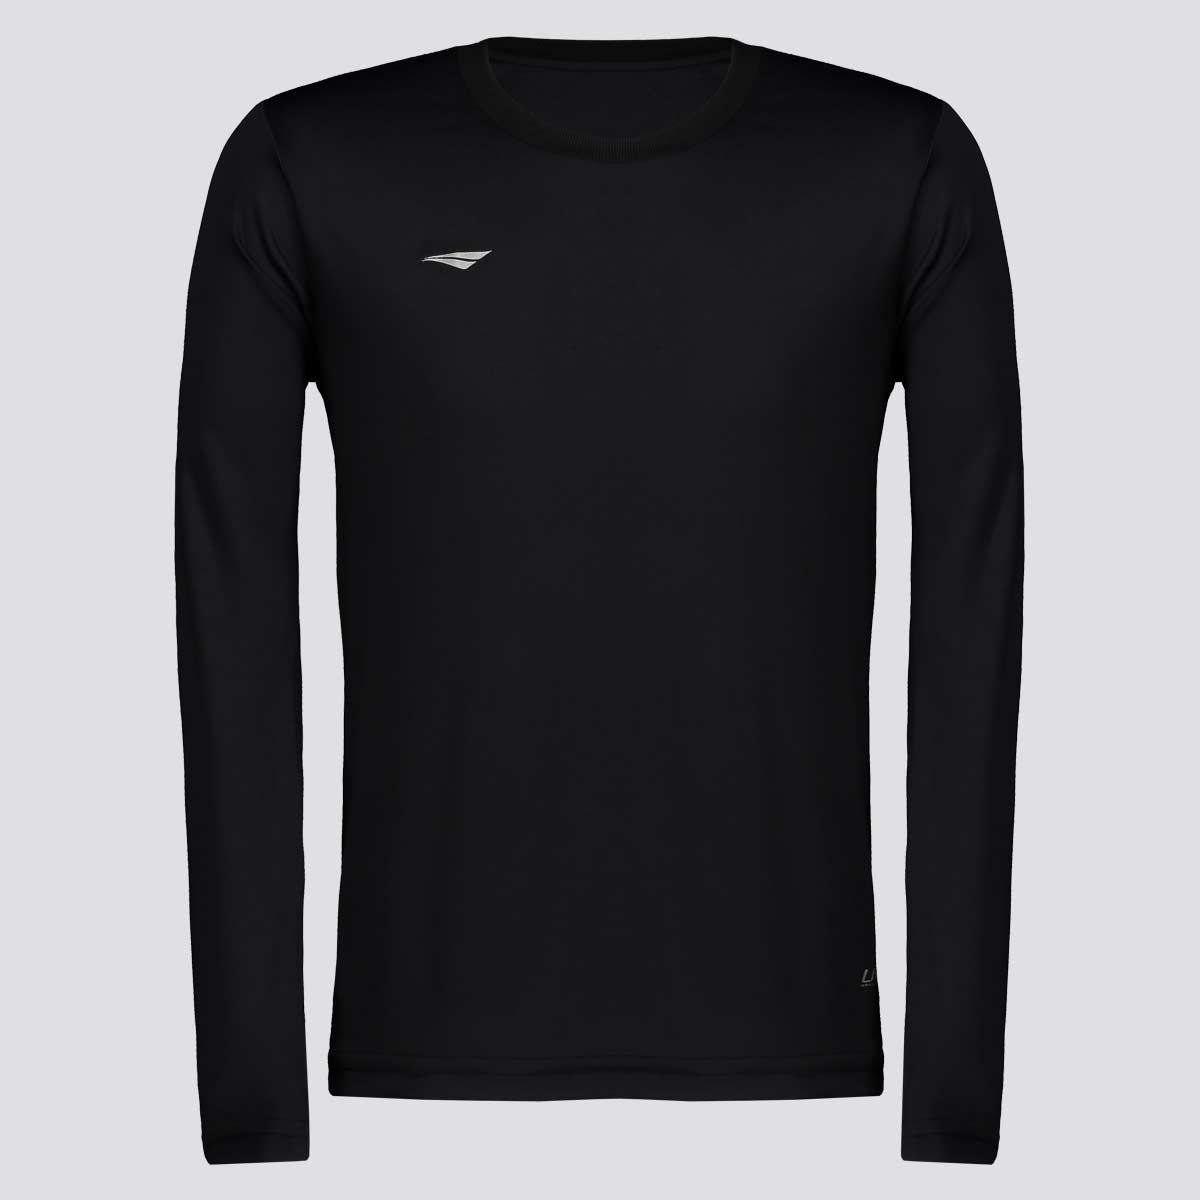 Camisa Penalty Matís Manga Longa Juvenil - Preto